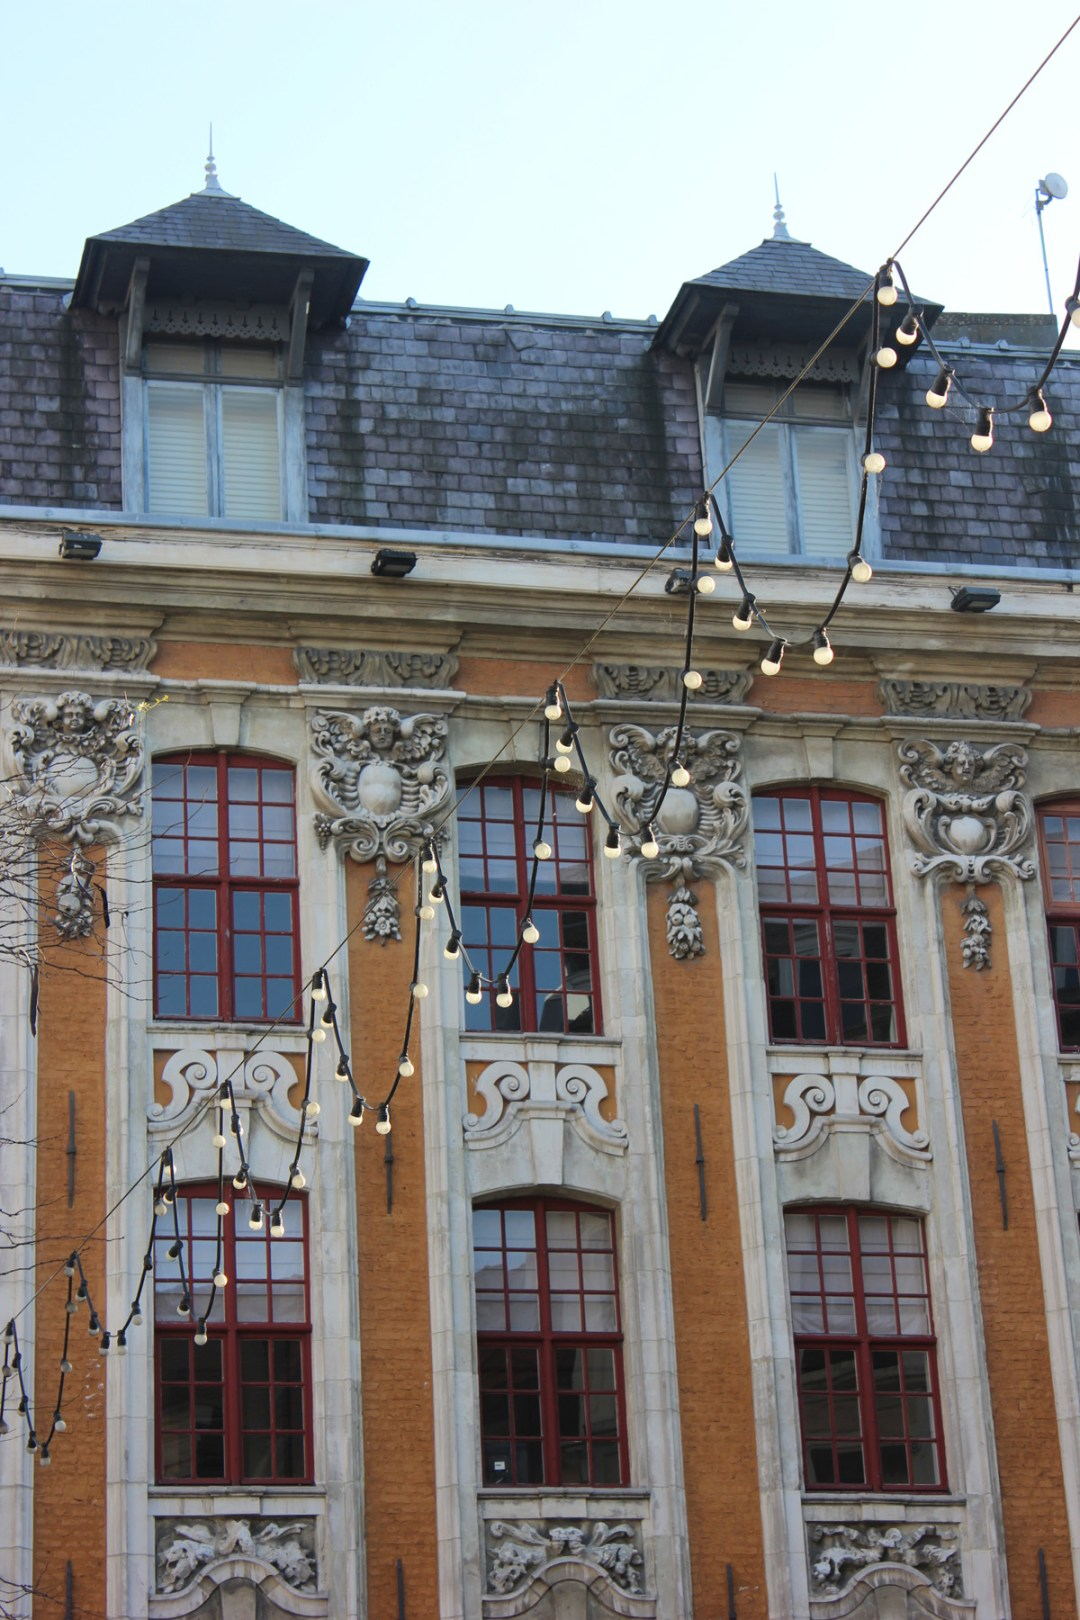 Lille-voyage-copyright-happynewgreen-2